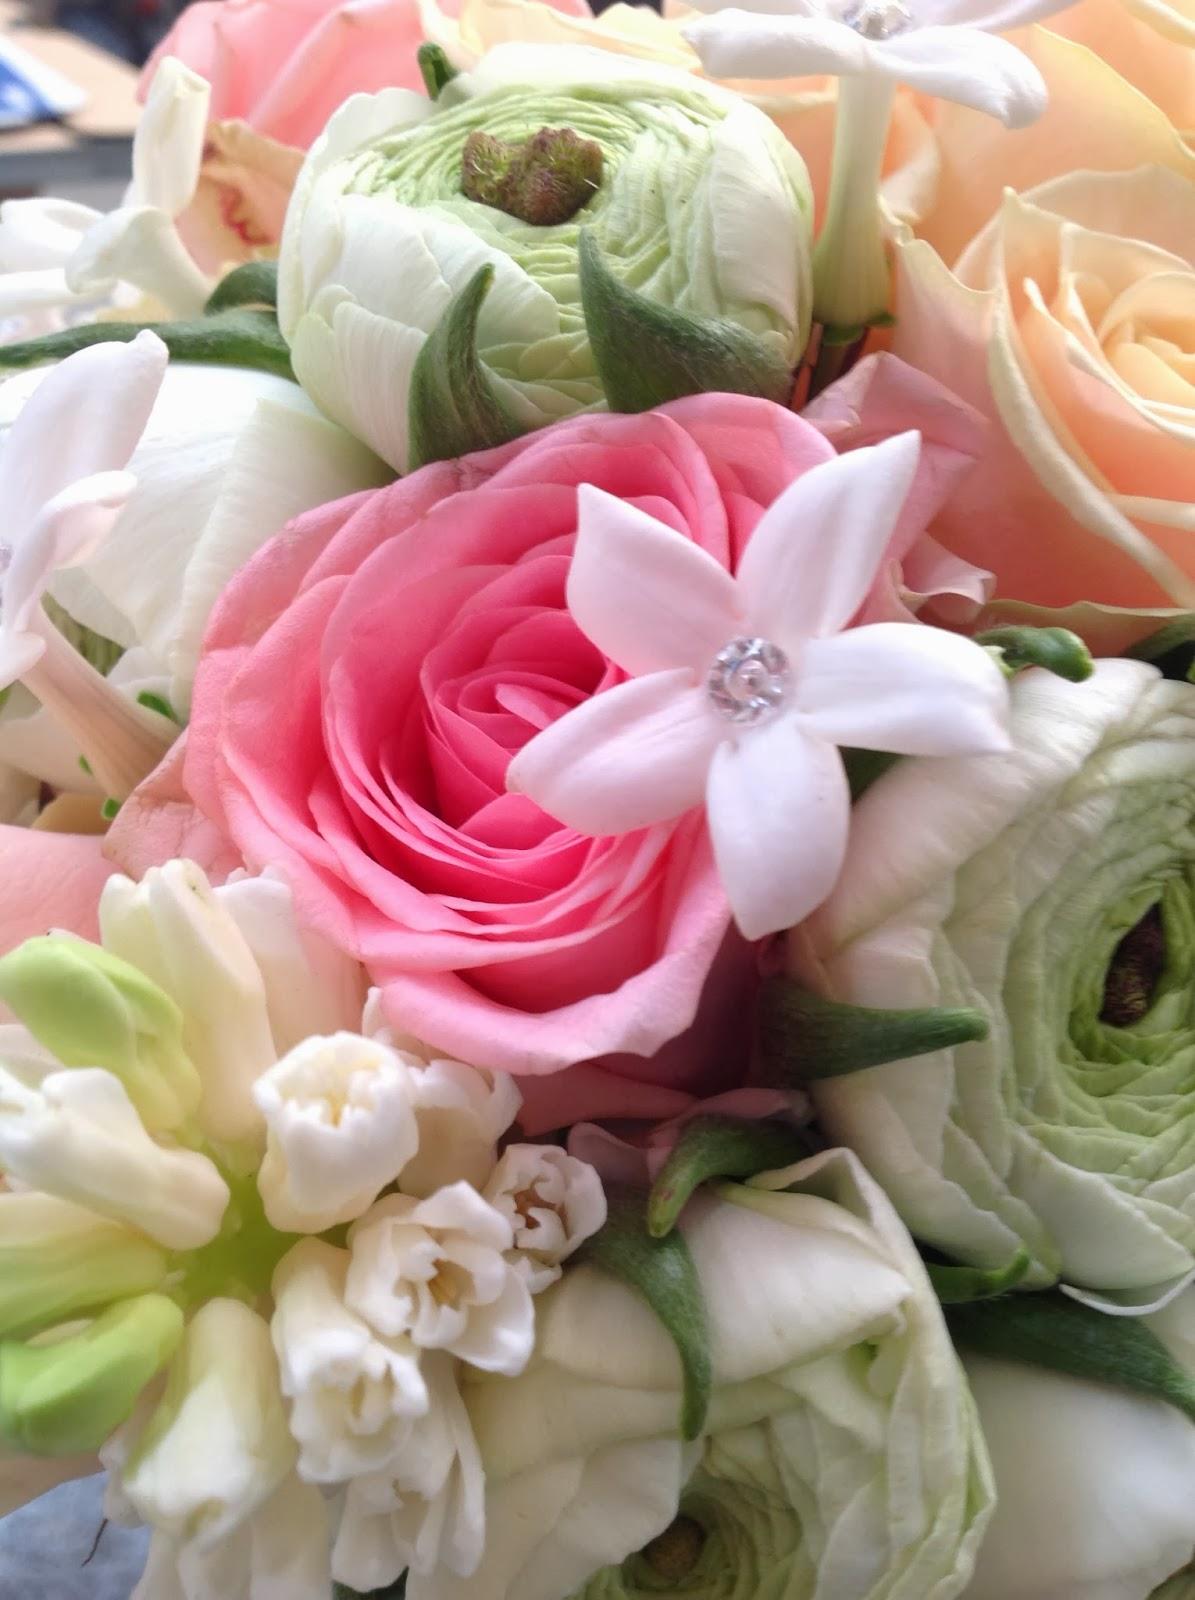 Ramos De Rosas Azules Imagenes - Ramos de novia Fotos de bouquet de rosas Ellahoy